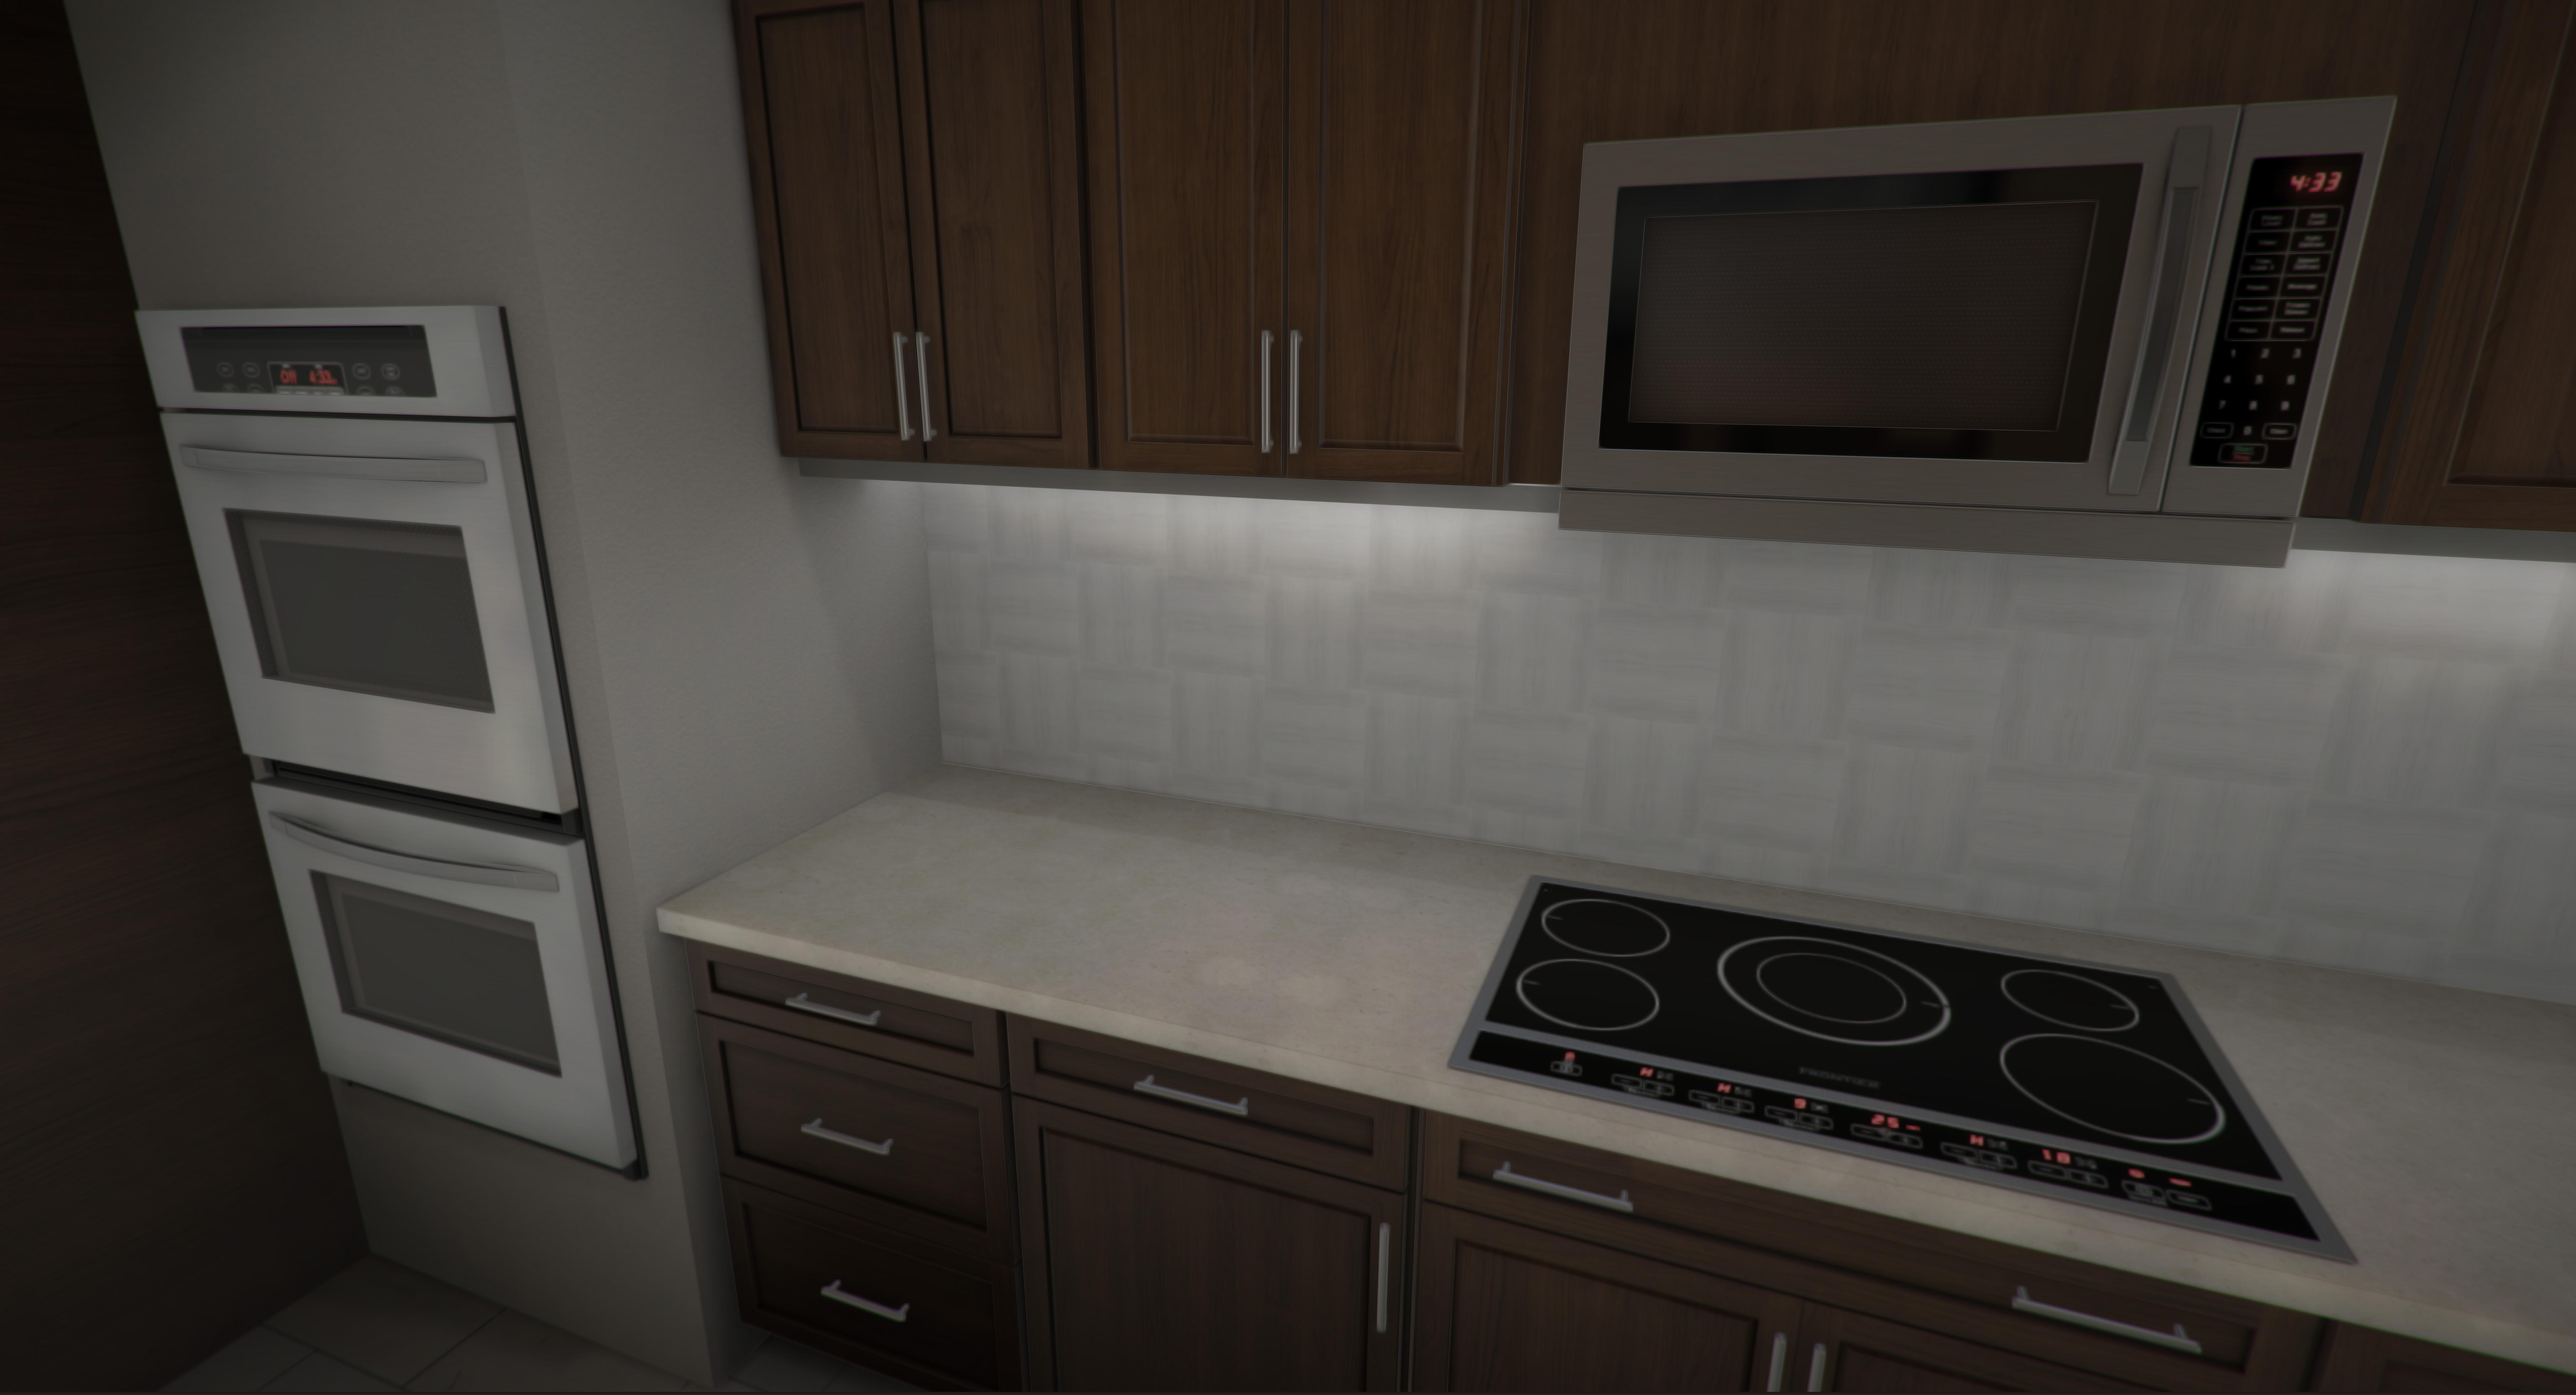 kitchen materials and interior design